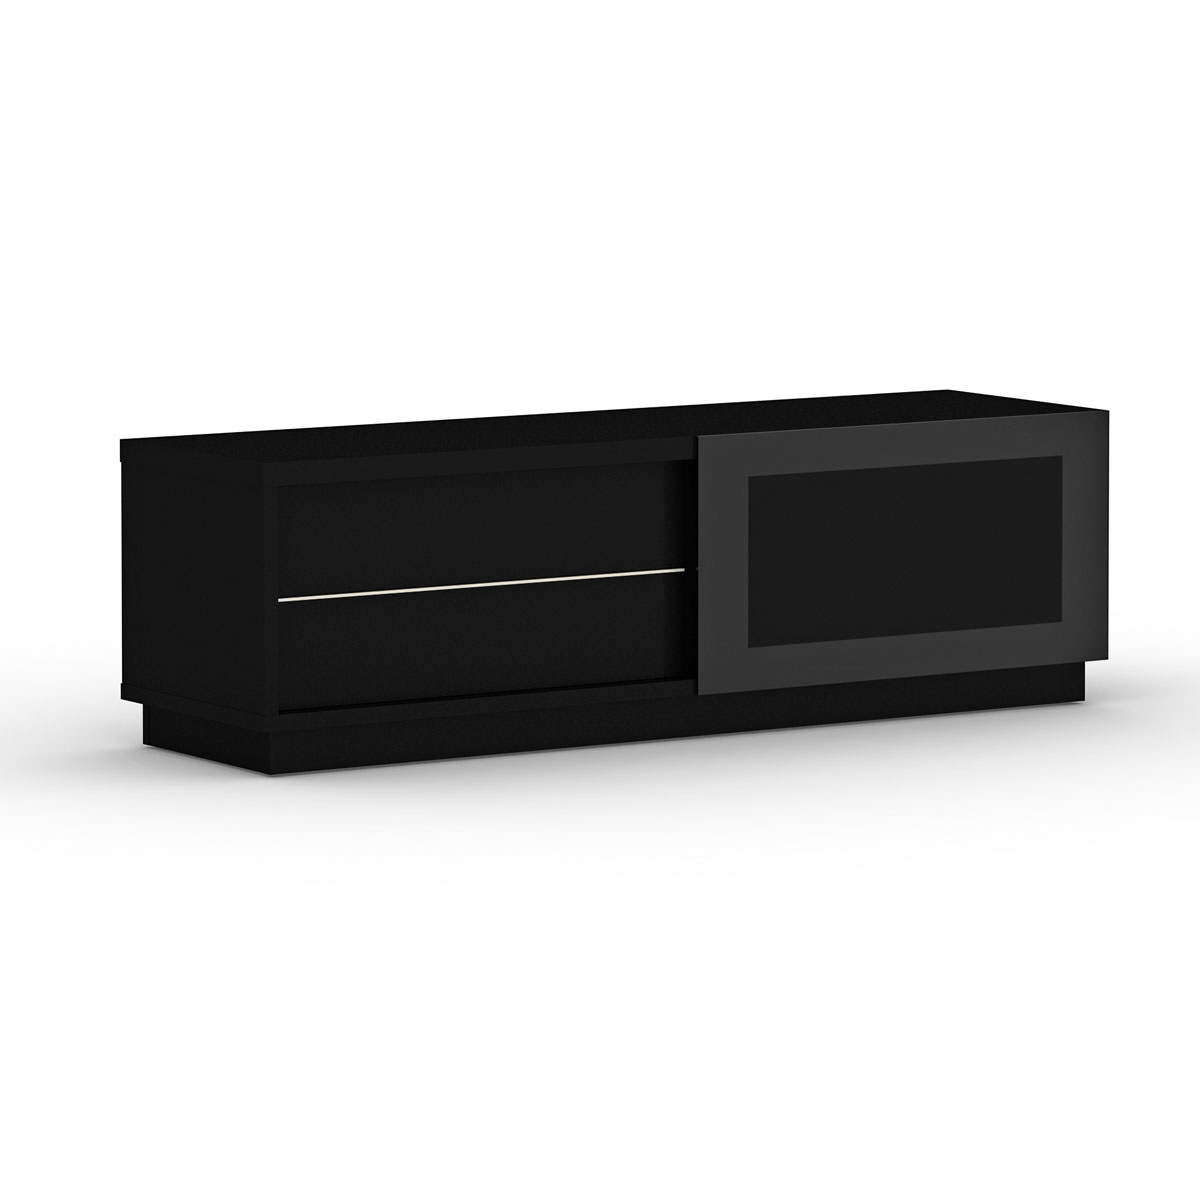 elmob harmony ha 160 02 noir meuble tv elmob sur. Black Bedroom Furniture Sets. Home Design Ideas